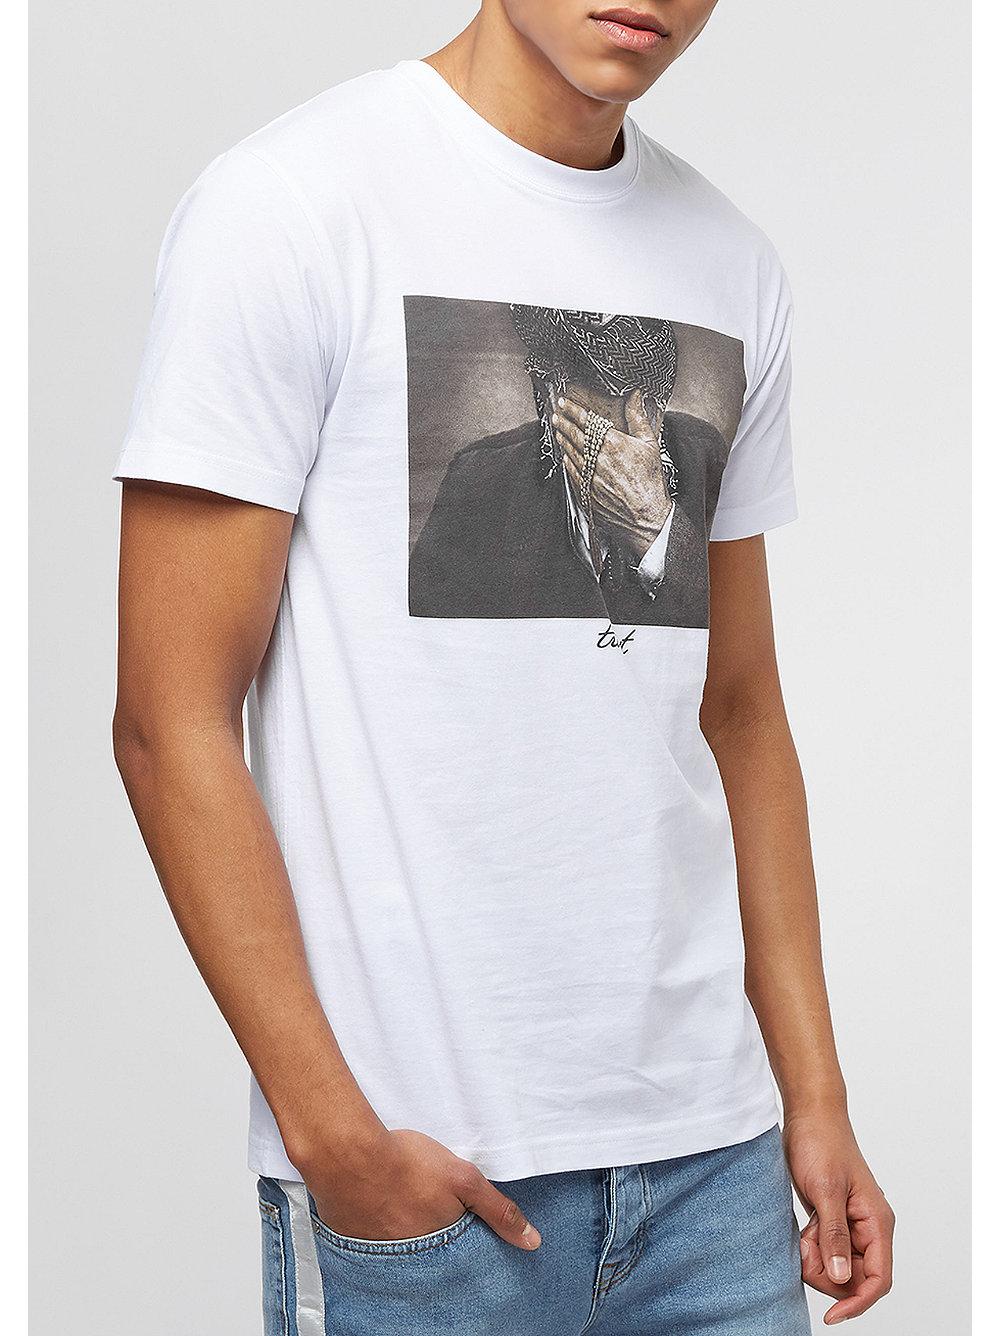 7968aa768b528 Camiseta Trust color blanco de Mister Tee en SNIPES